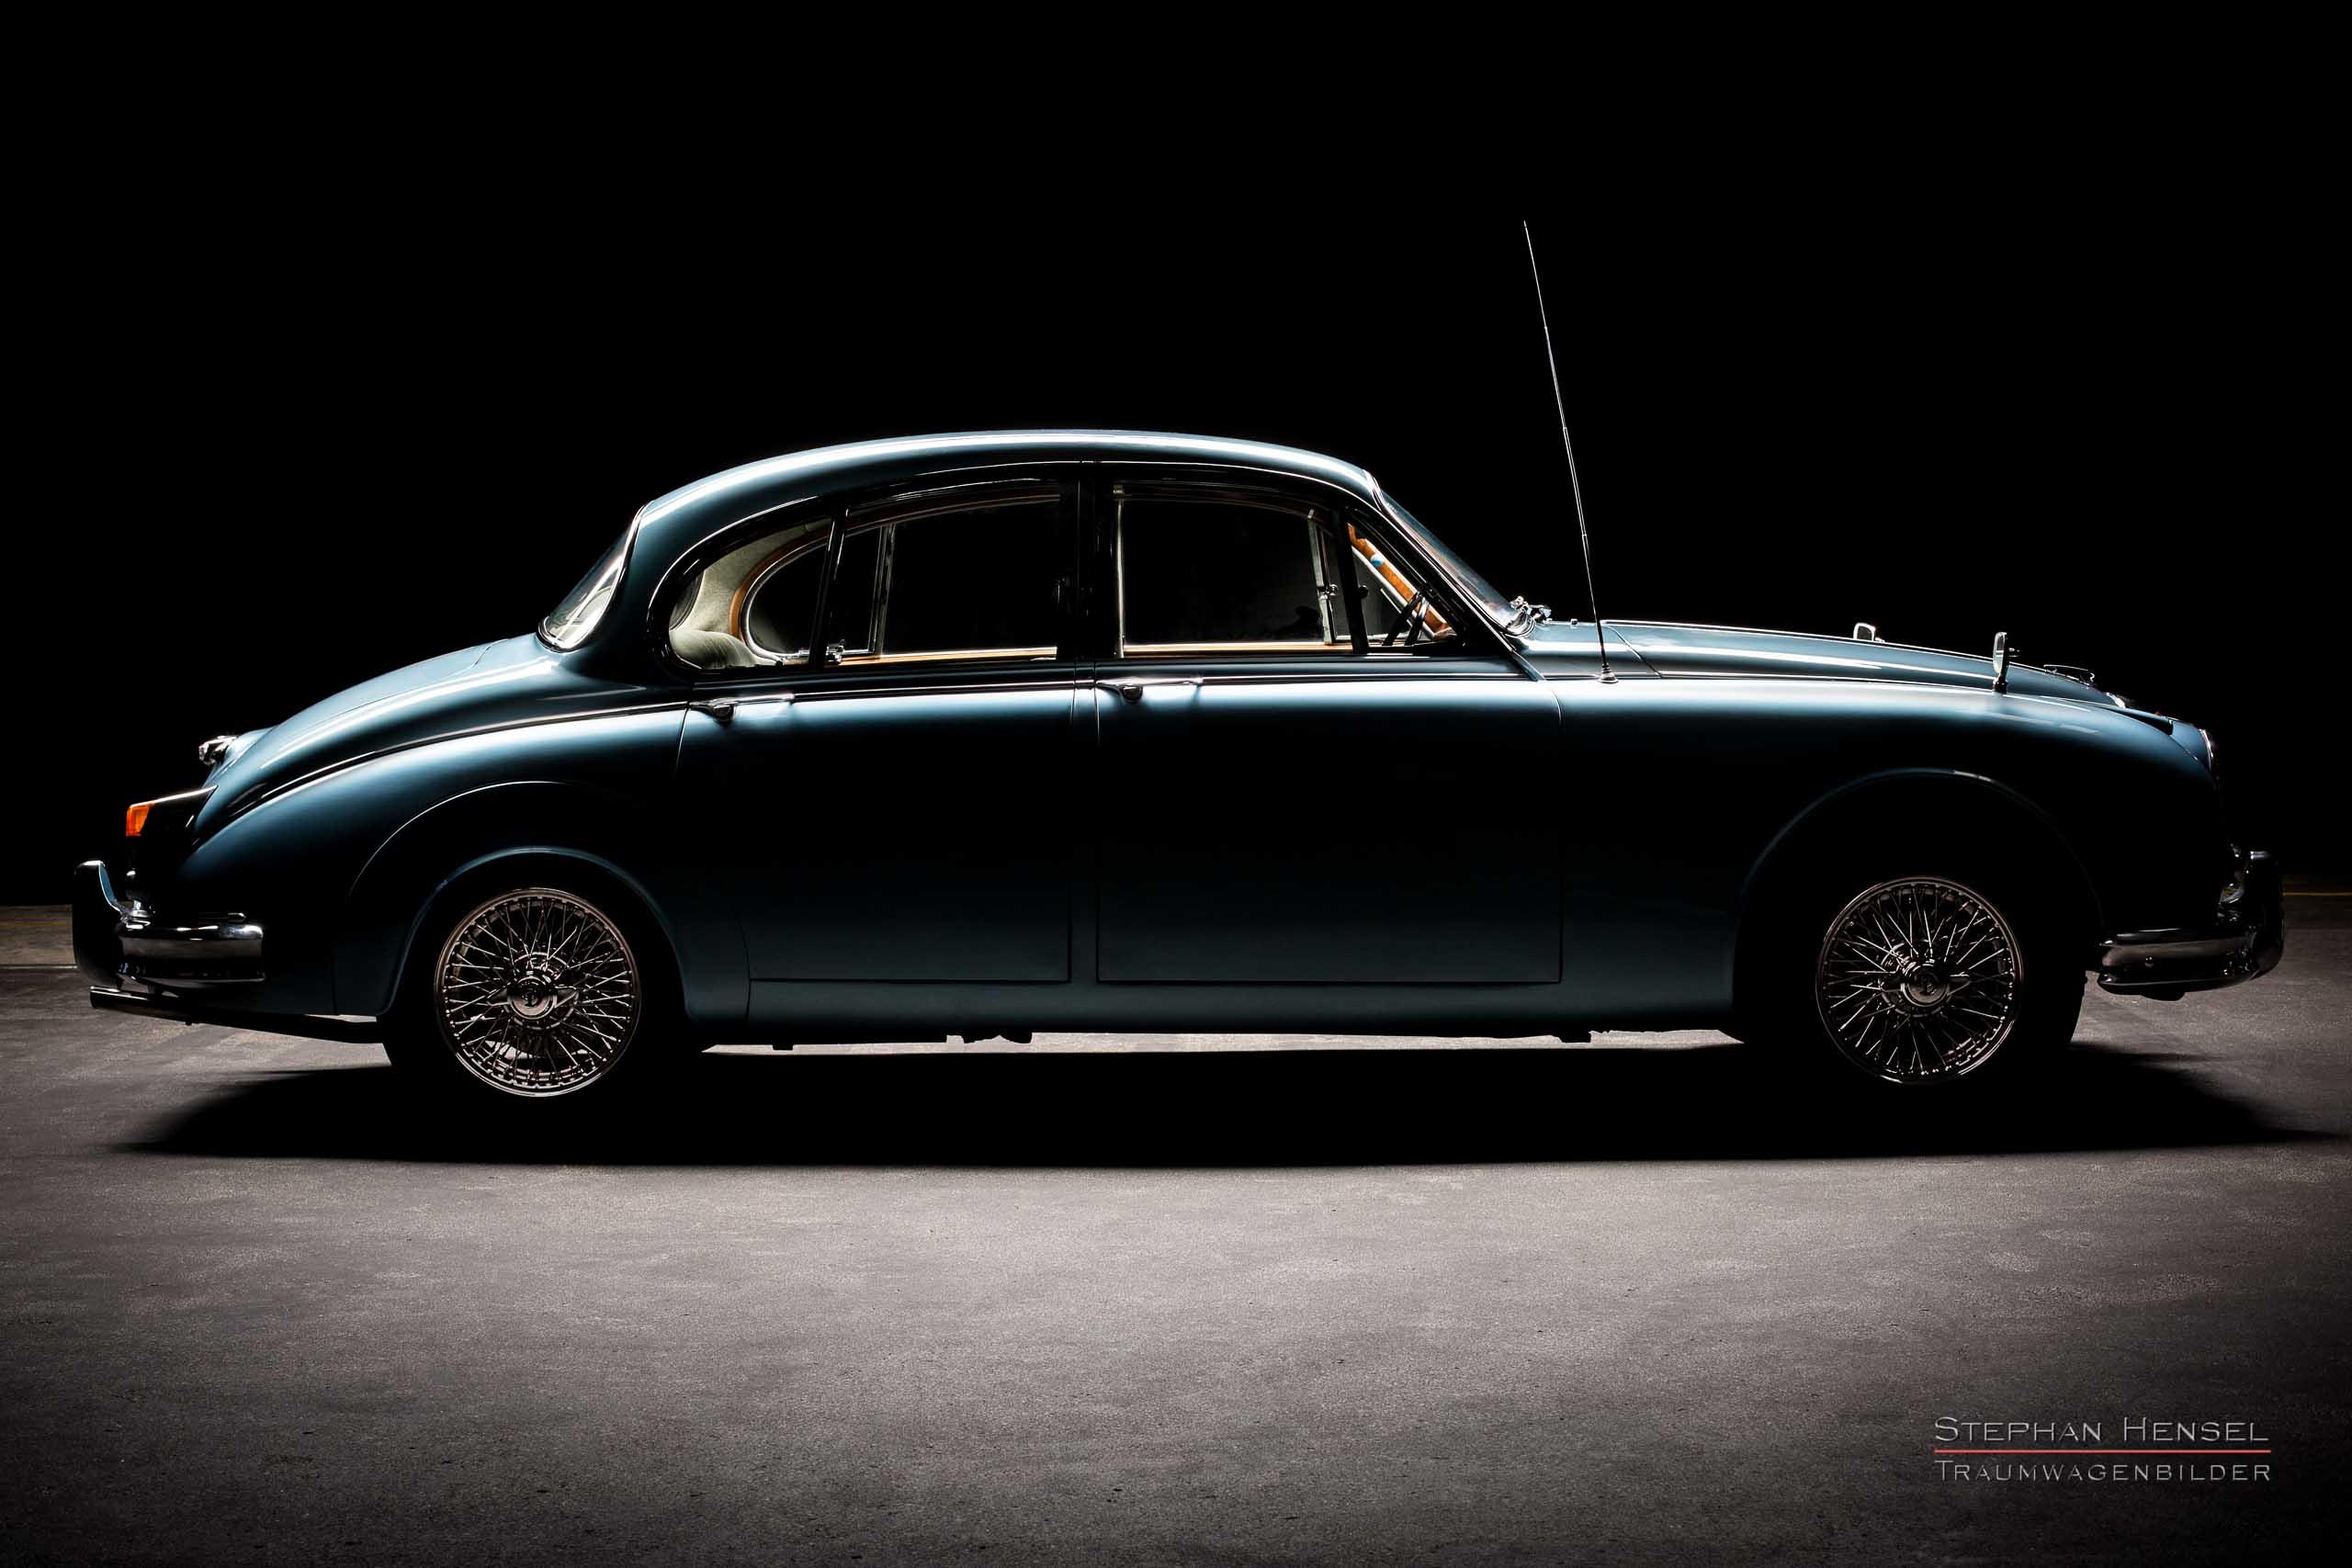 Daimler 250 V8 Saloon, Seitenansicht, Autofotografie: Stephan Hensel, Hamburg, Oldtimerfotograf, Oldtimerfotografie